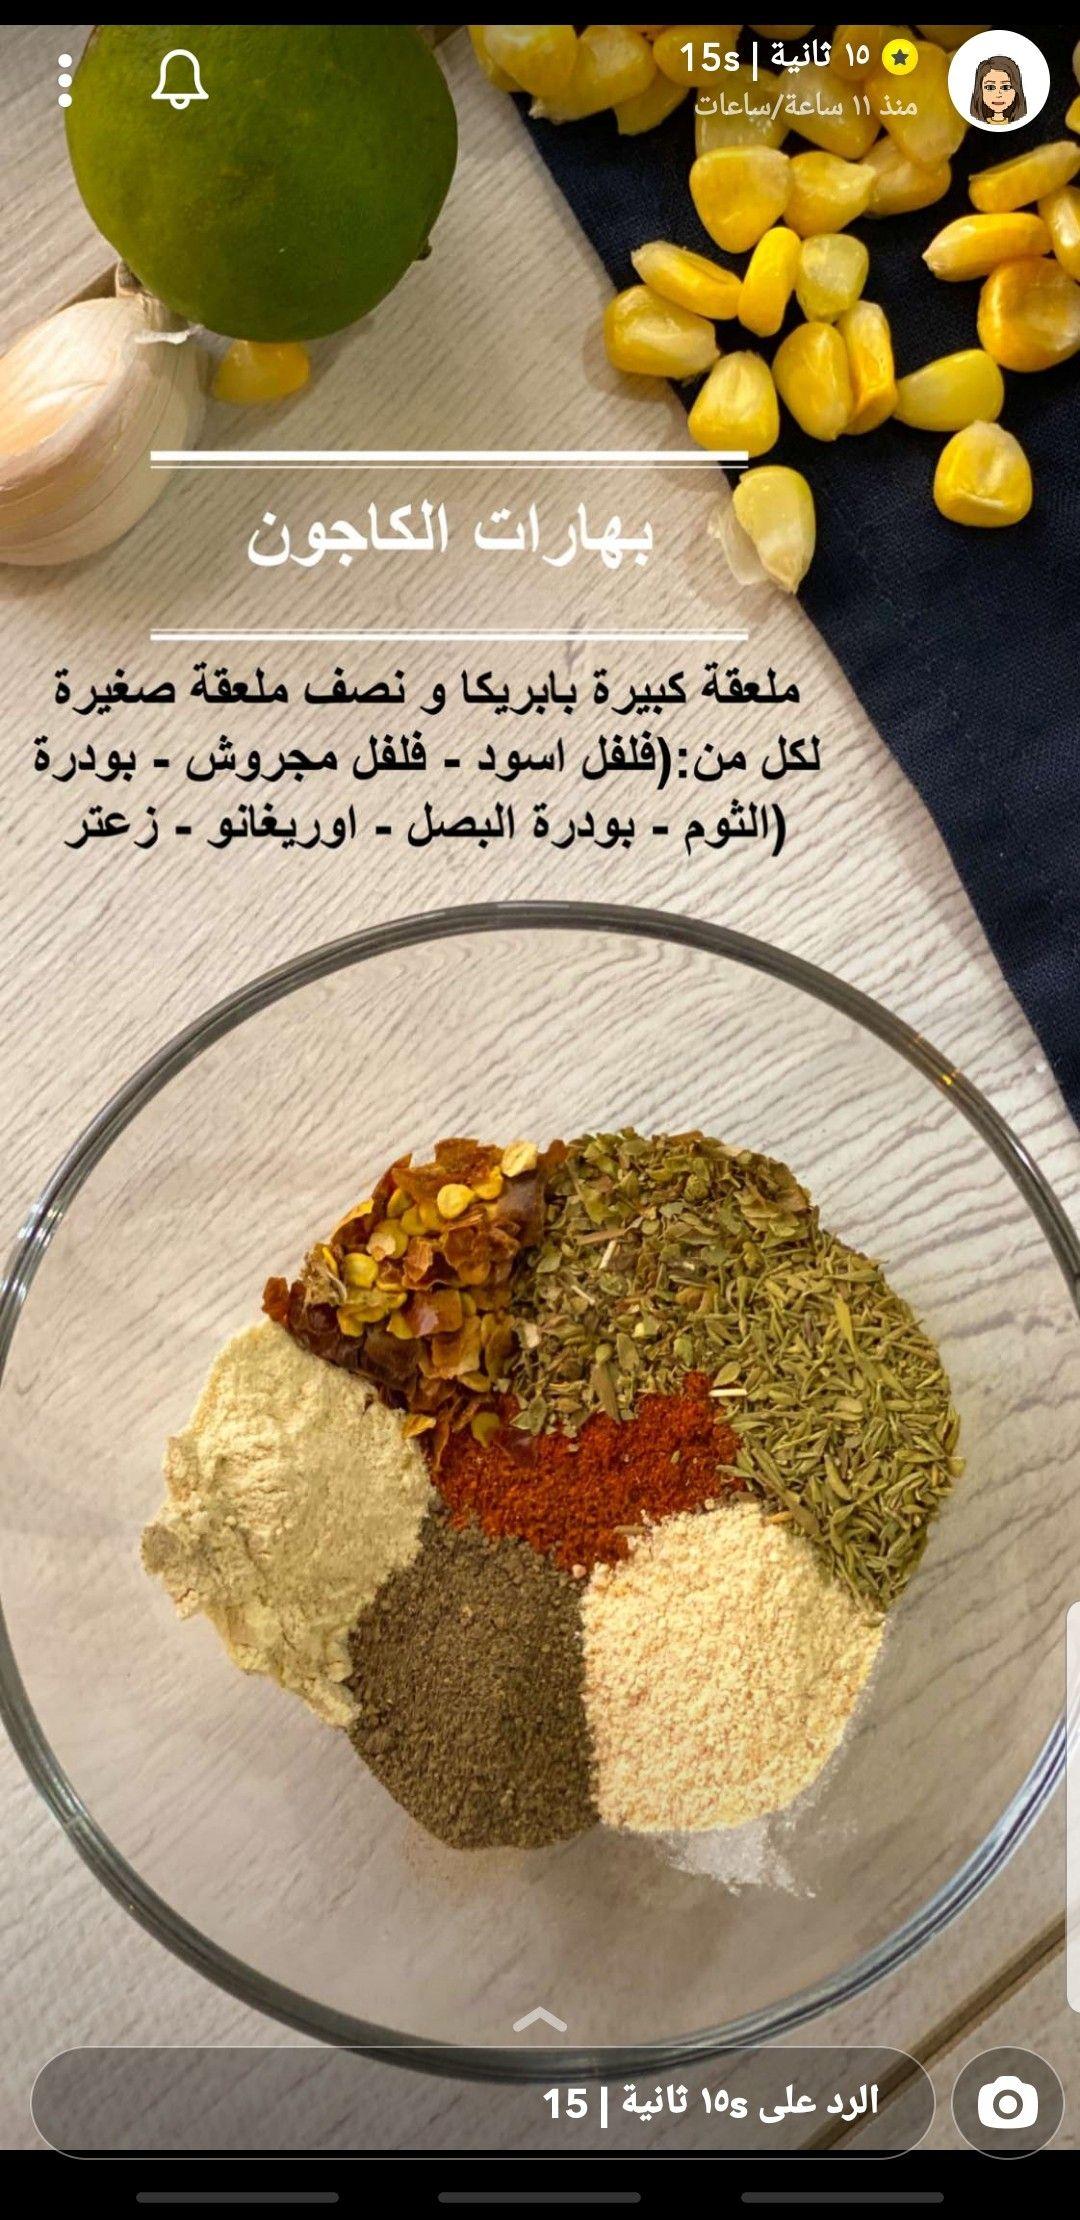 Pin By Hayam Samaha On Food طبخ Food Dishes Food Receipes Save Food